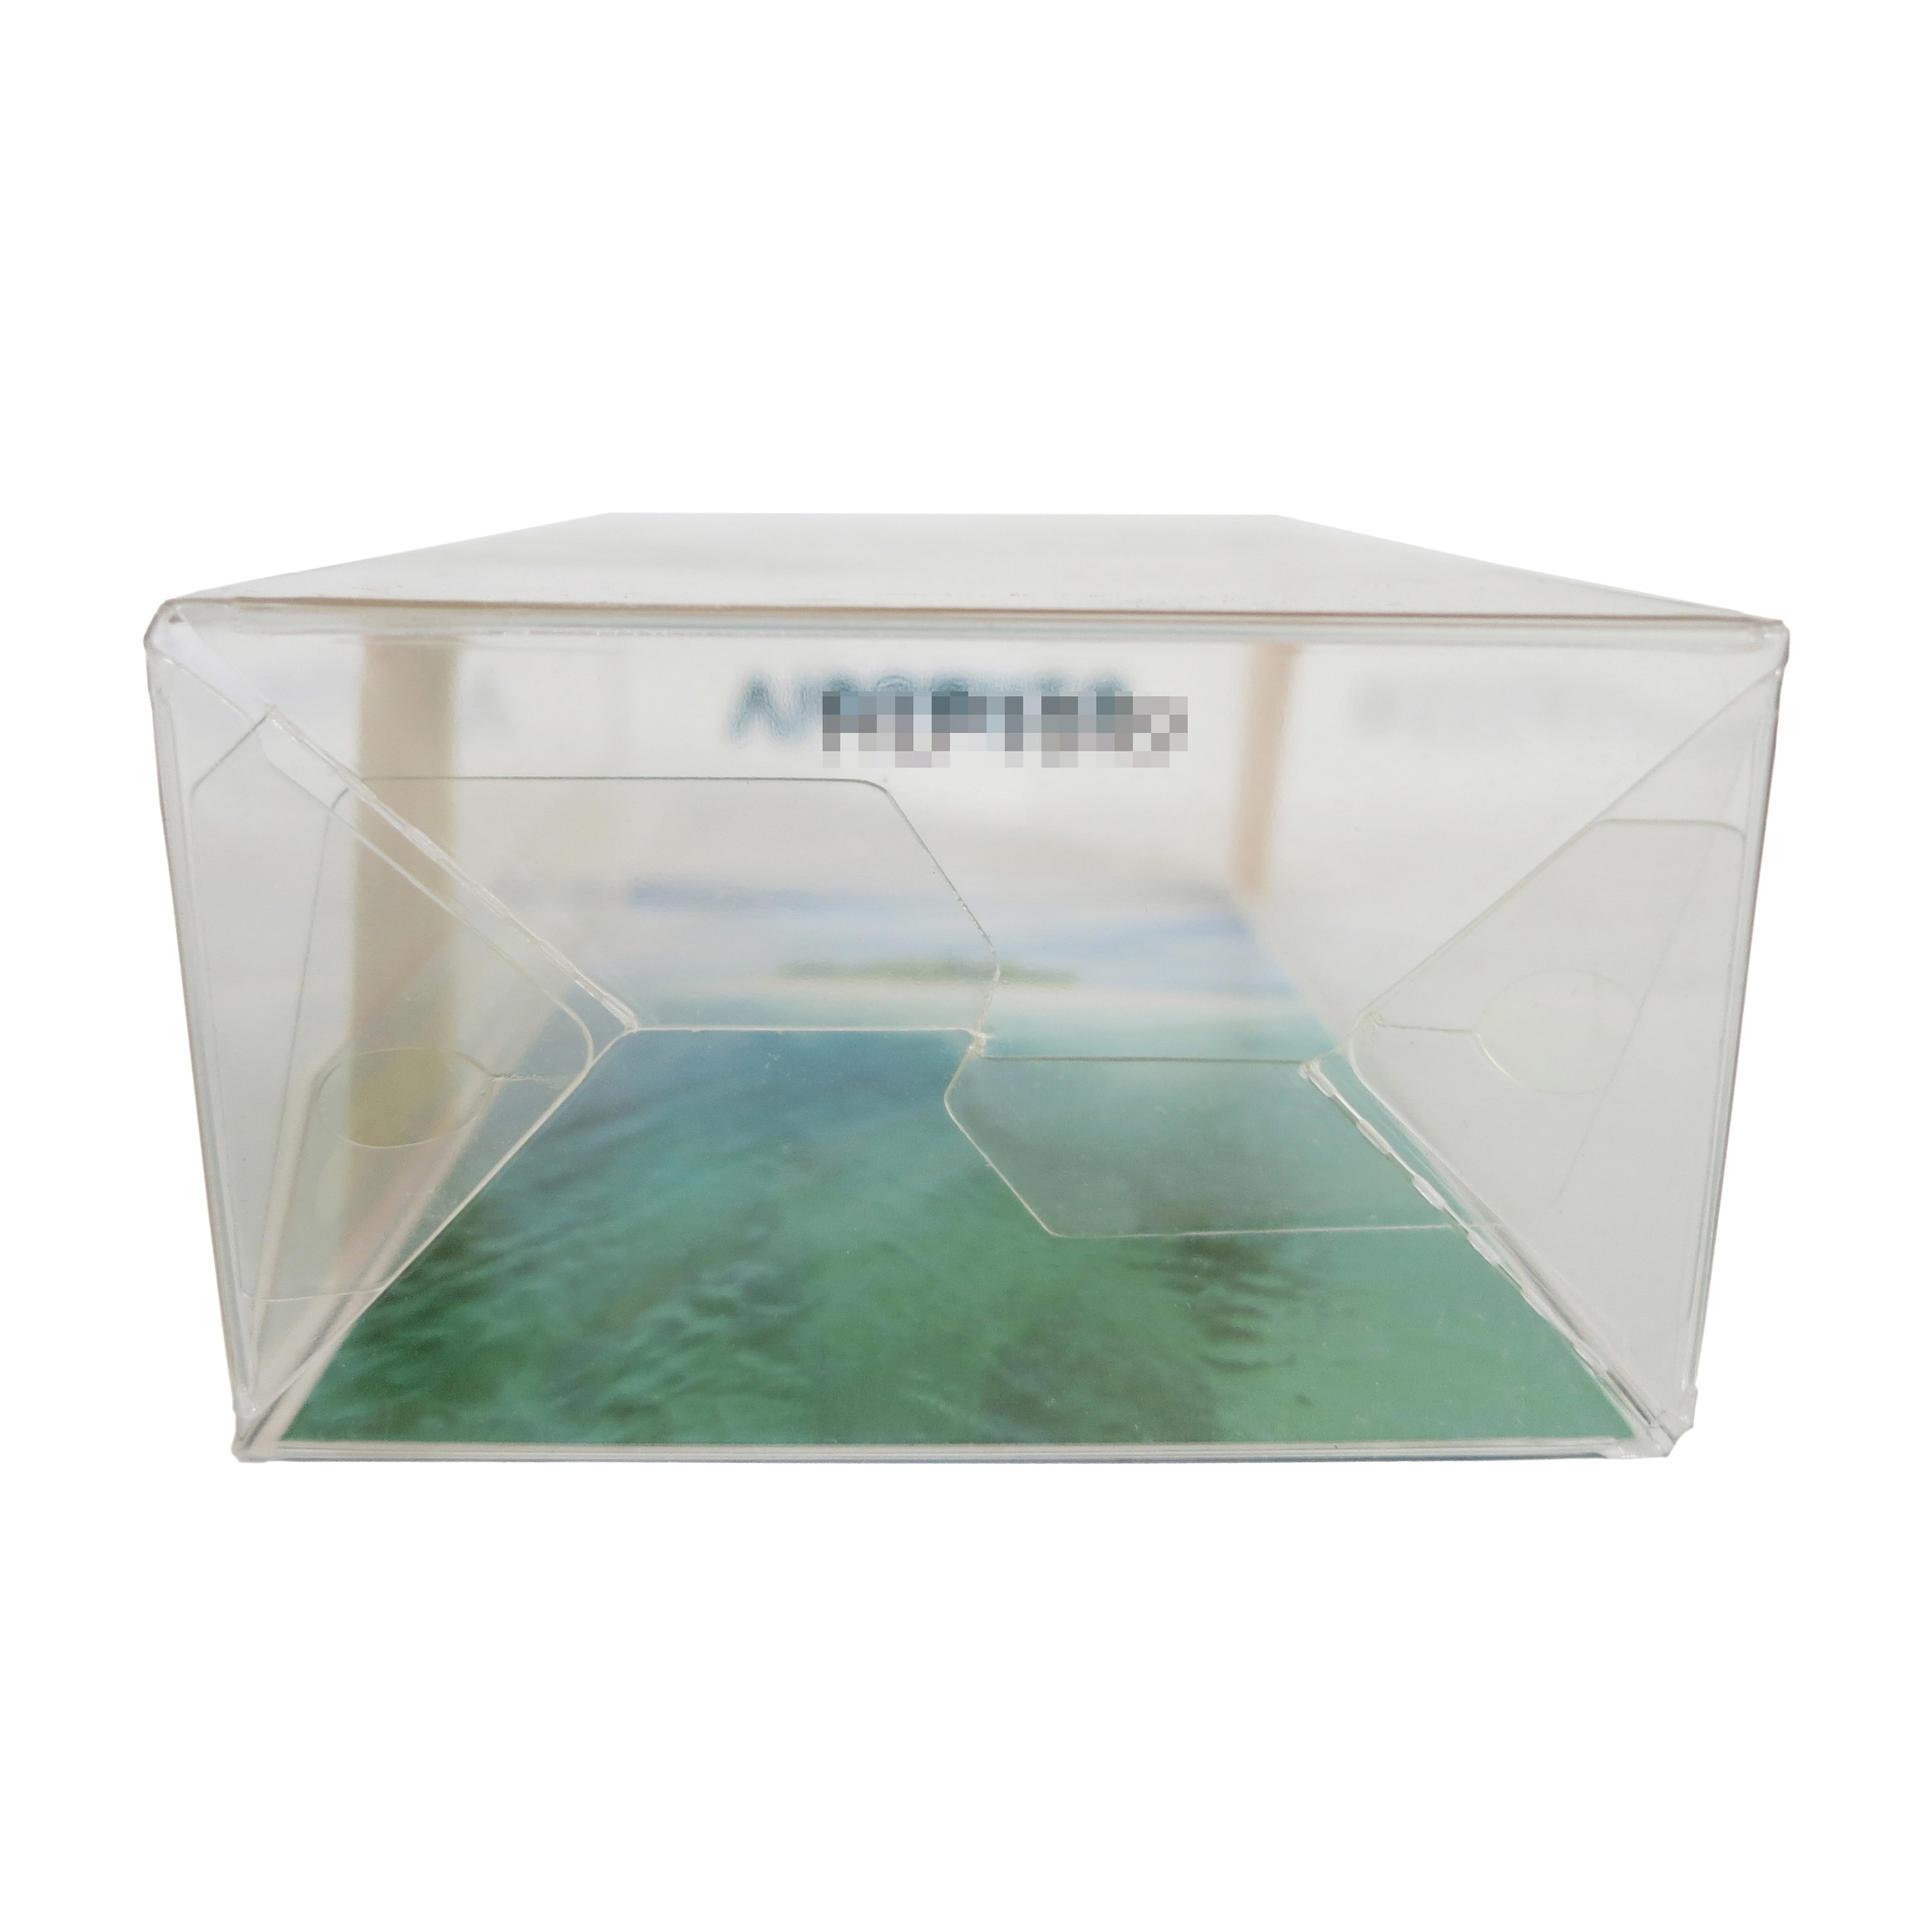 Inside & Outside Printing Plastic Auto-Lock Bottom Packaging Box